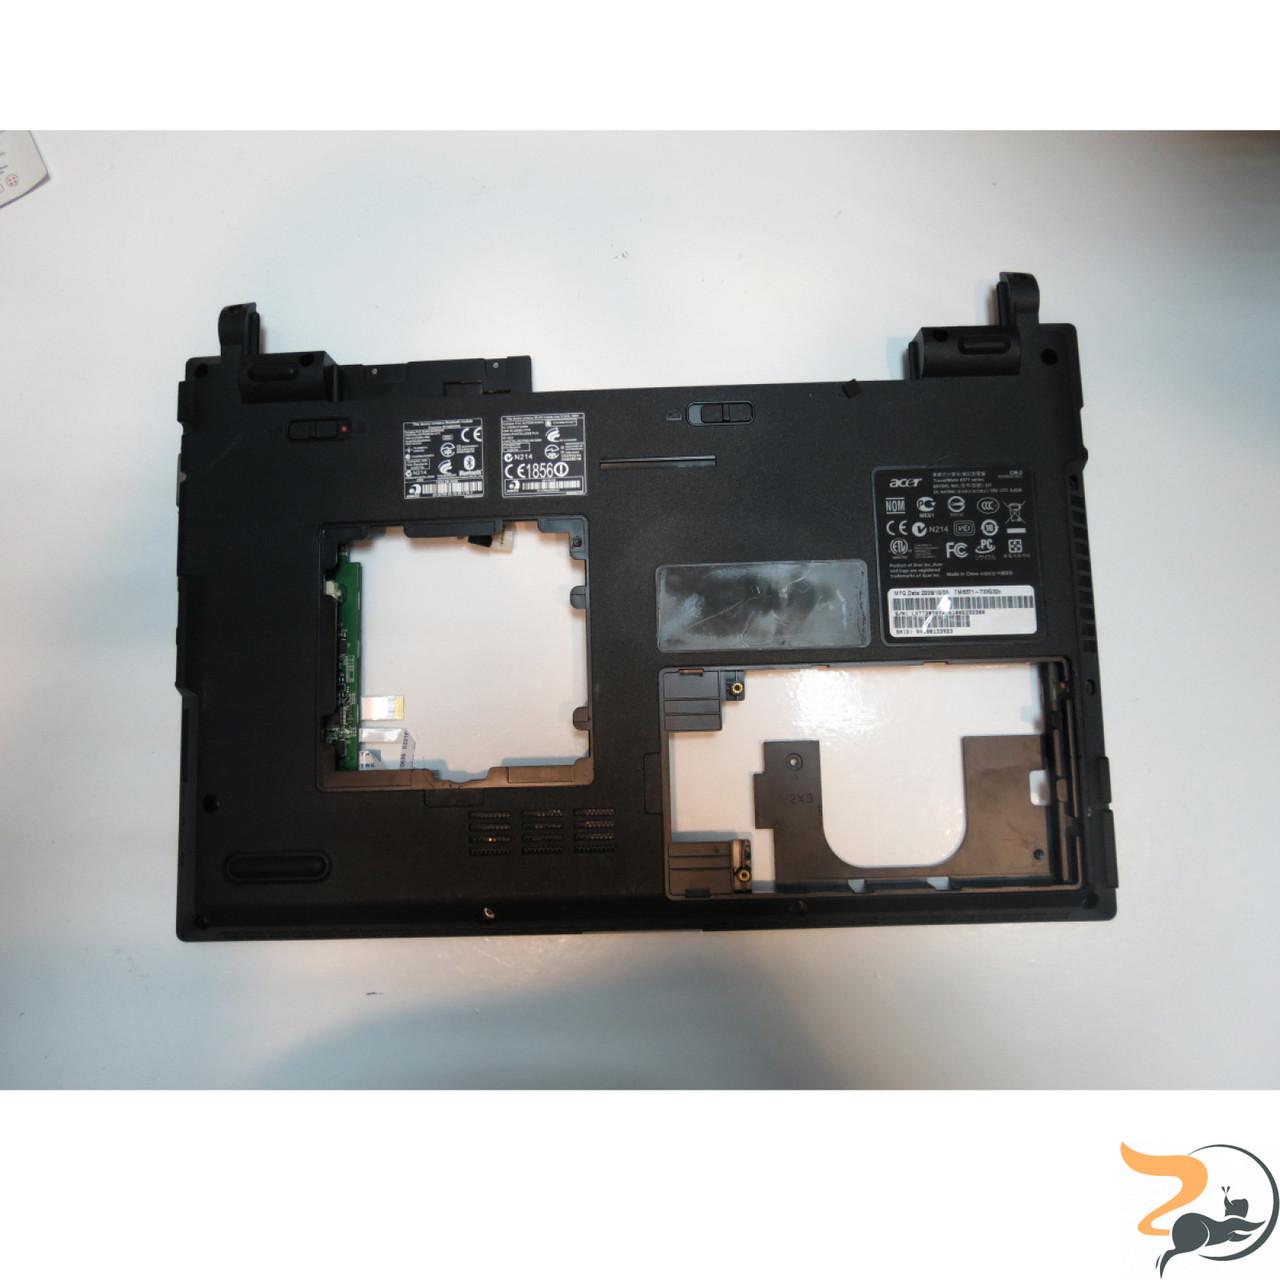 "Нижня частина корпуса для ноутбука Acer TravelMate 8371, LI1, B03759011131, 13.3"", Б/В."